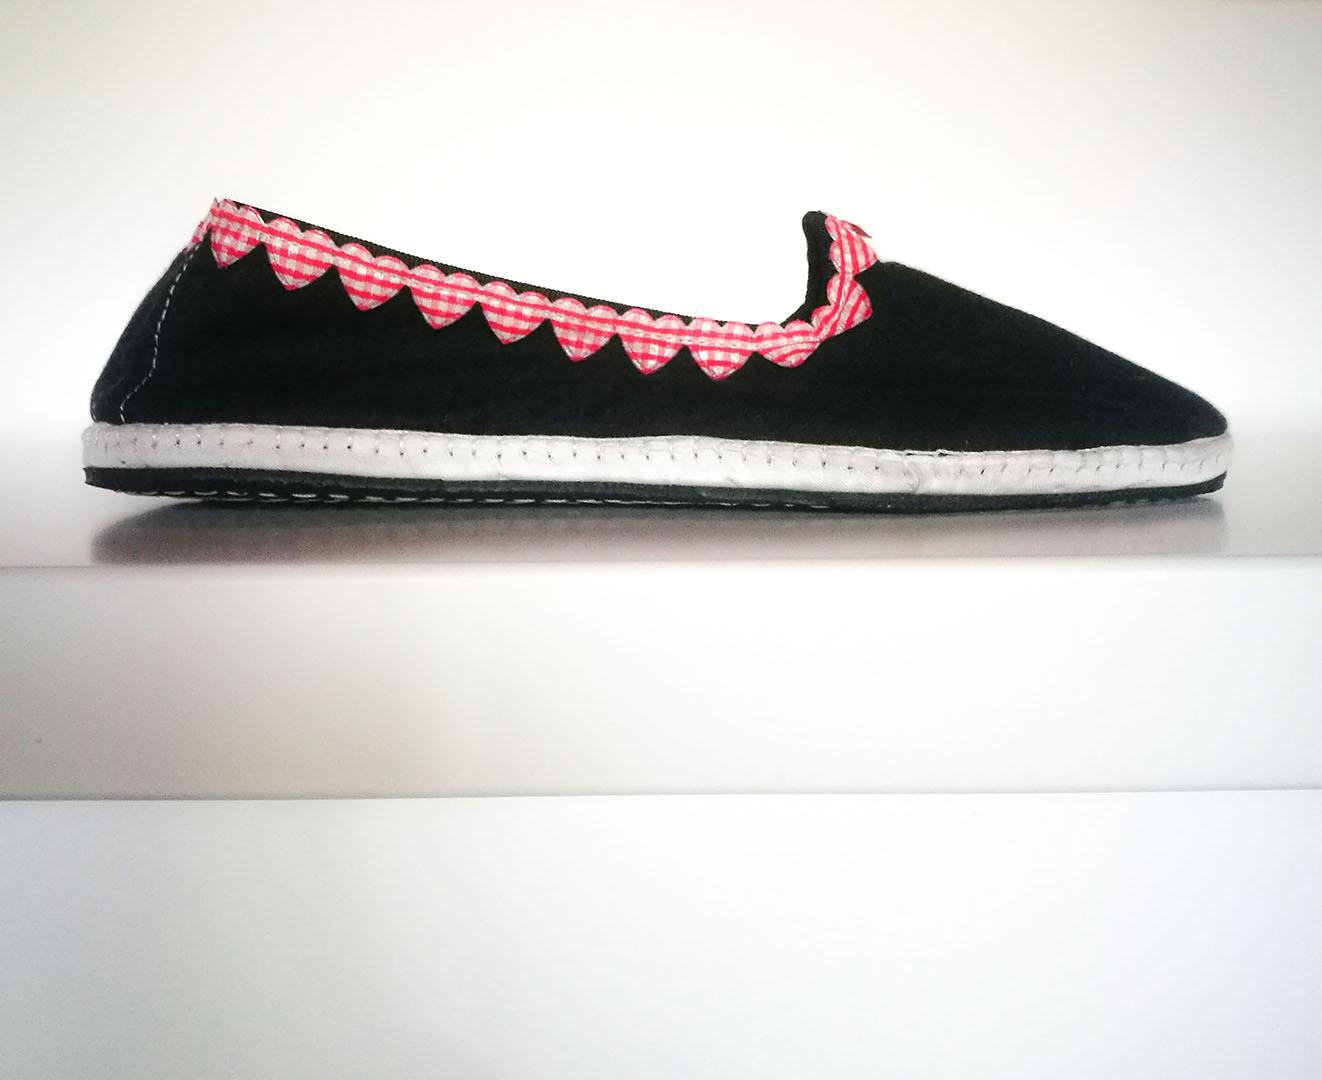 scarpez friulane con cuori tradizionali handmade lis furlanis